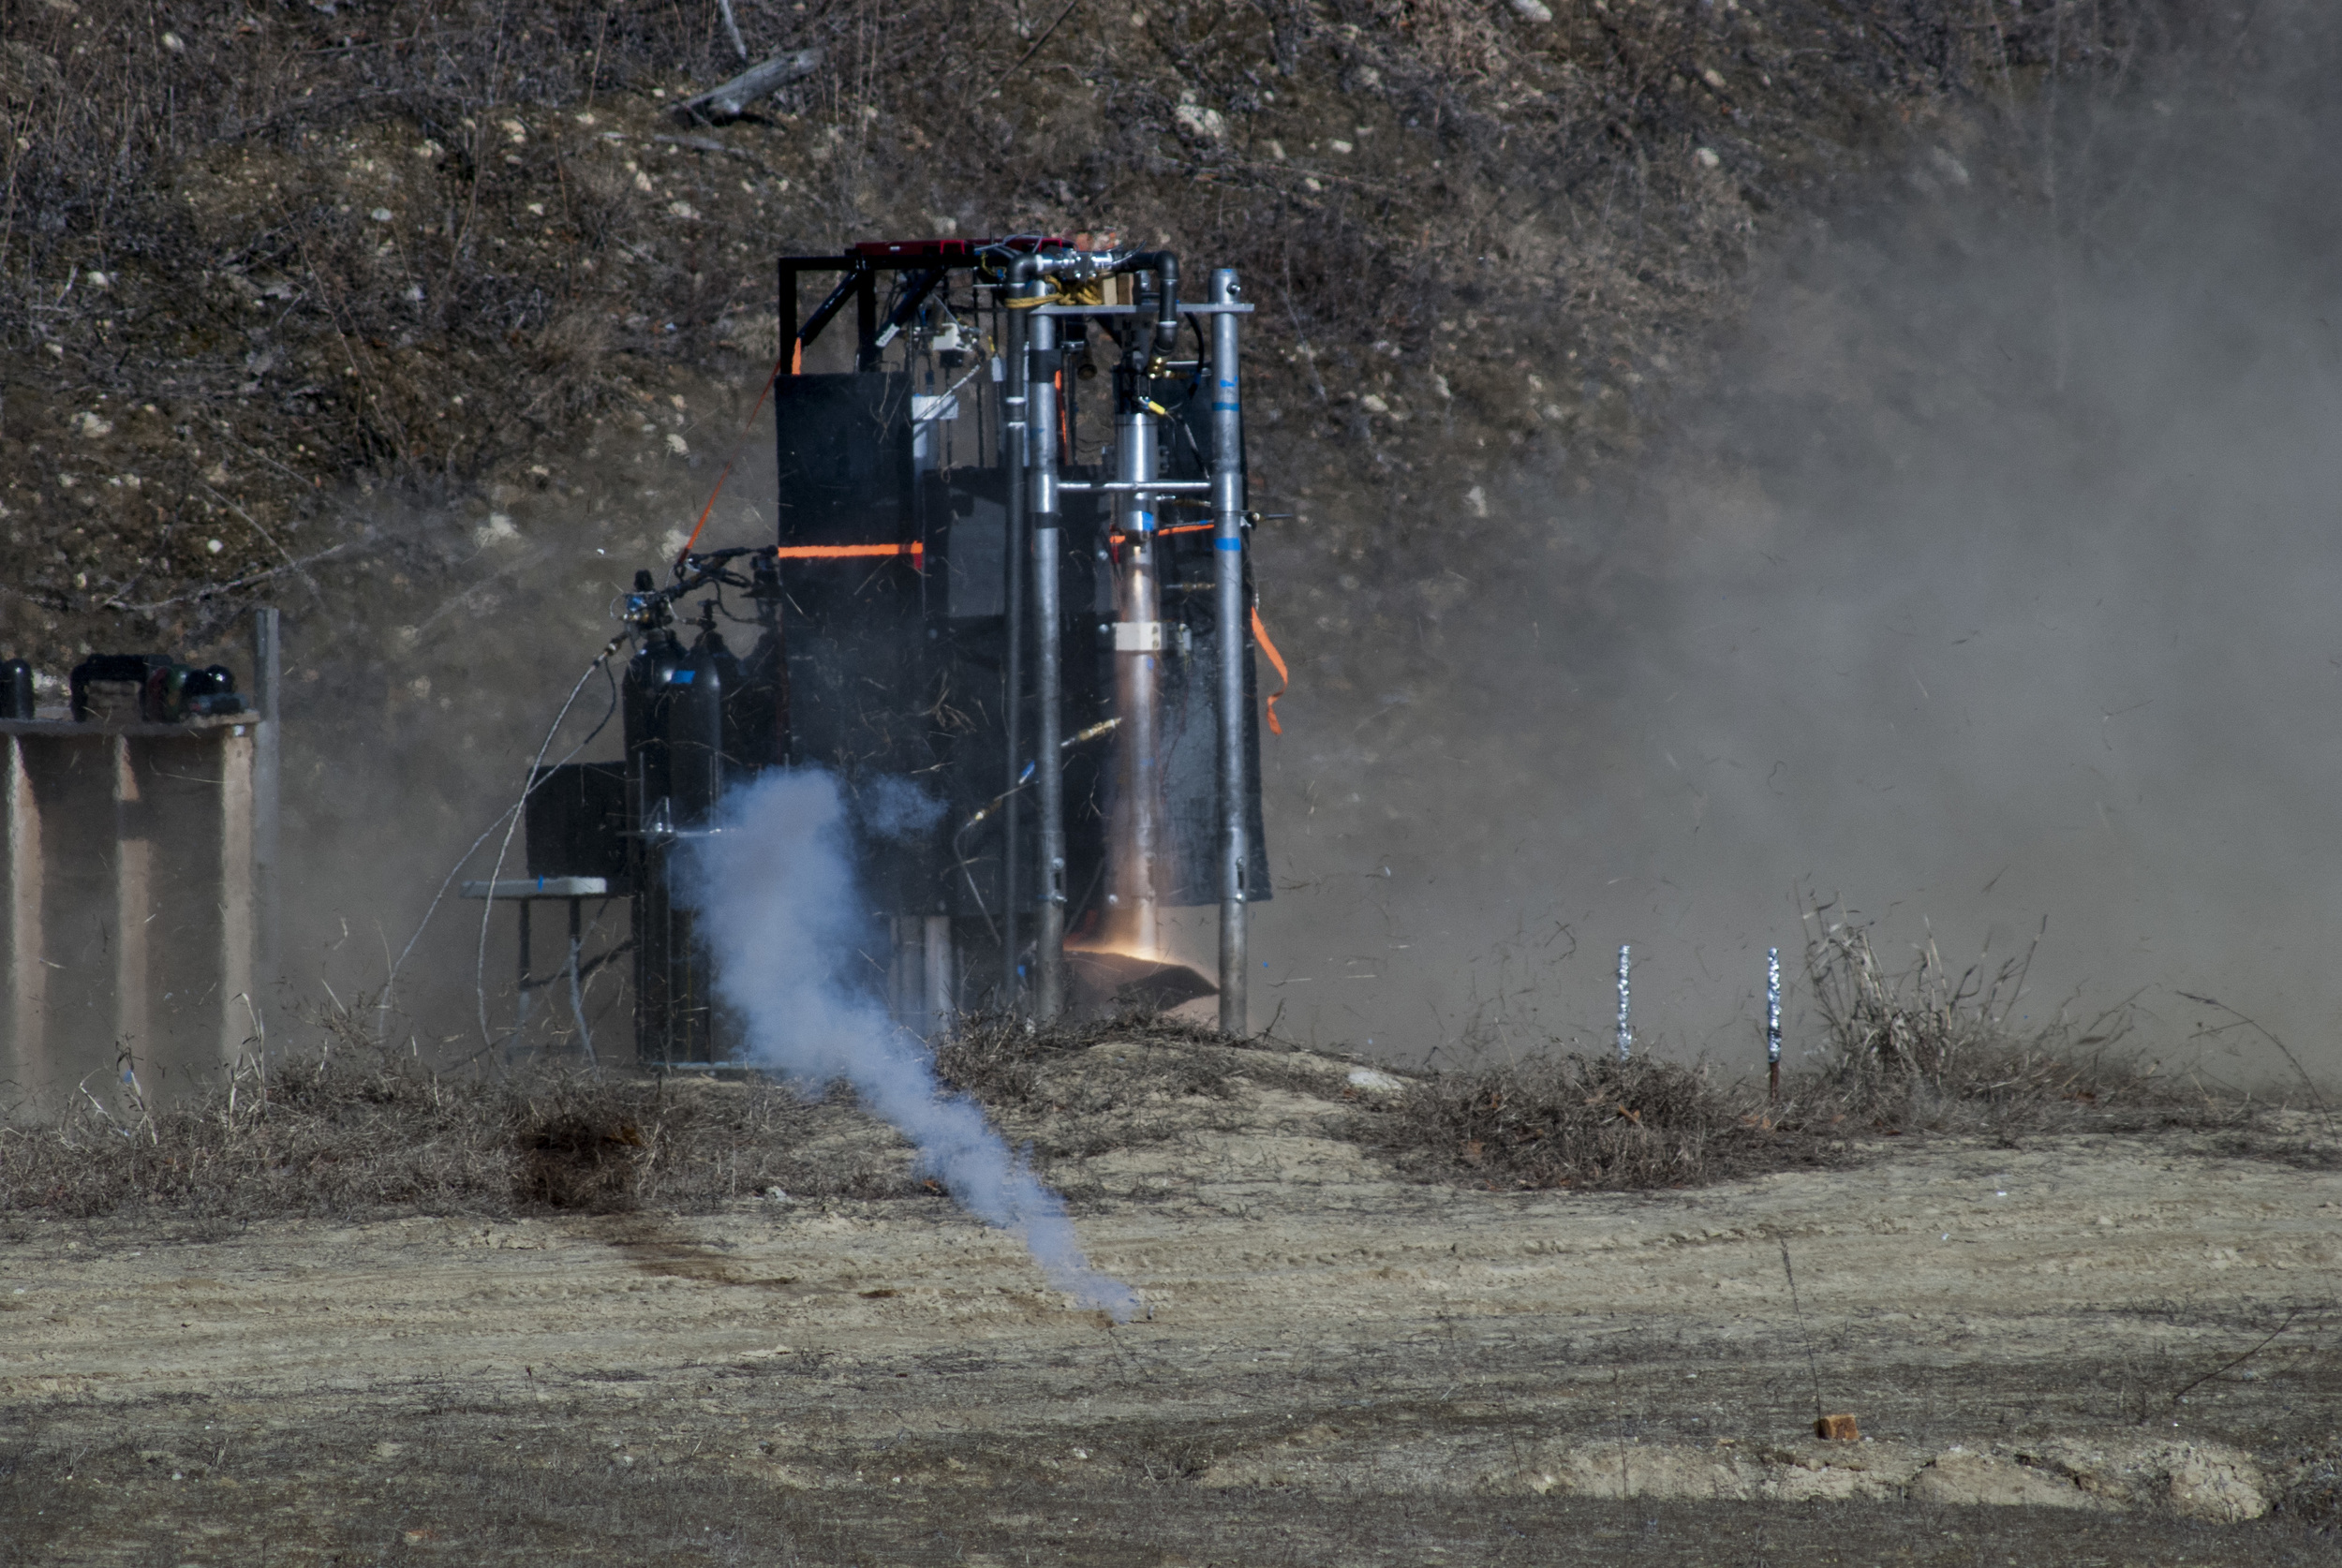 Lotus during hot fire testing